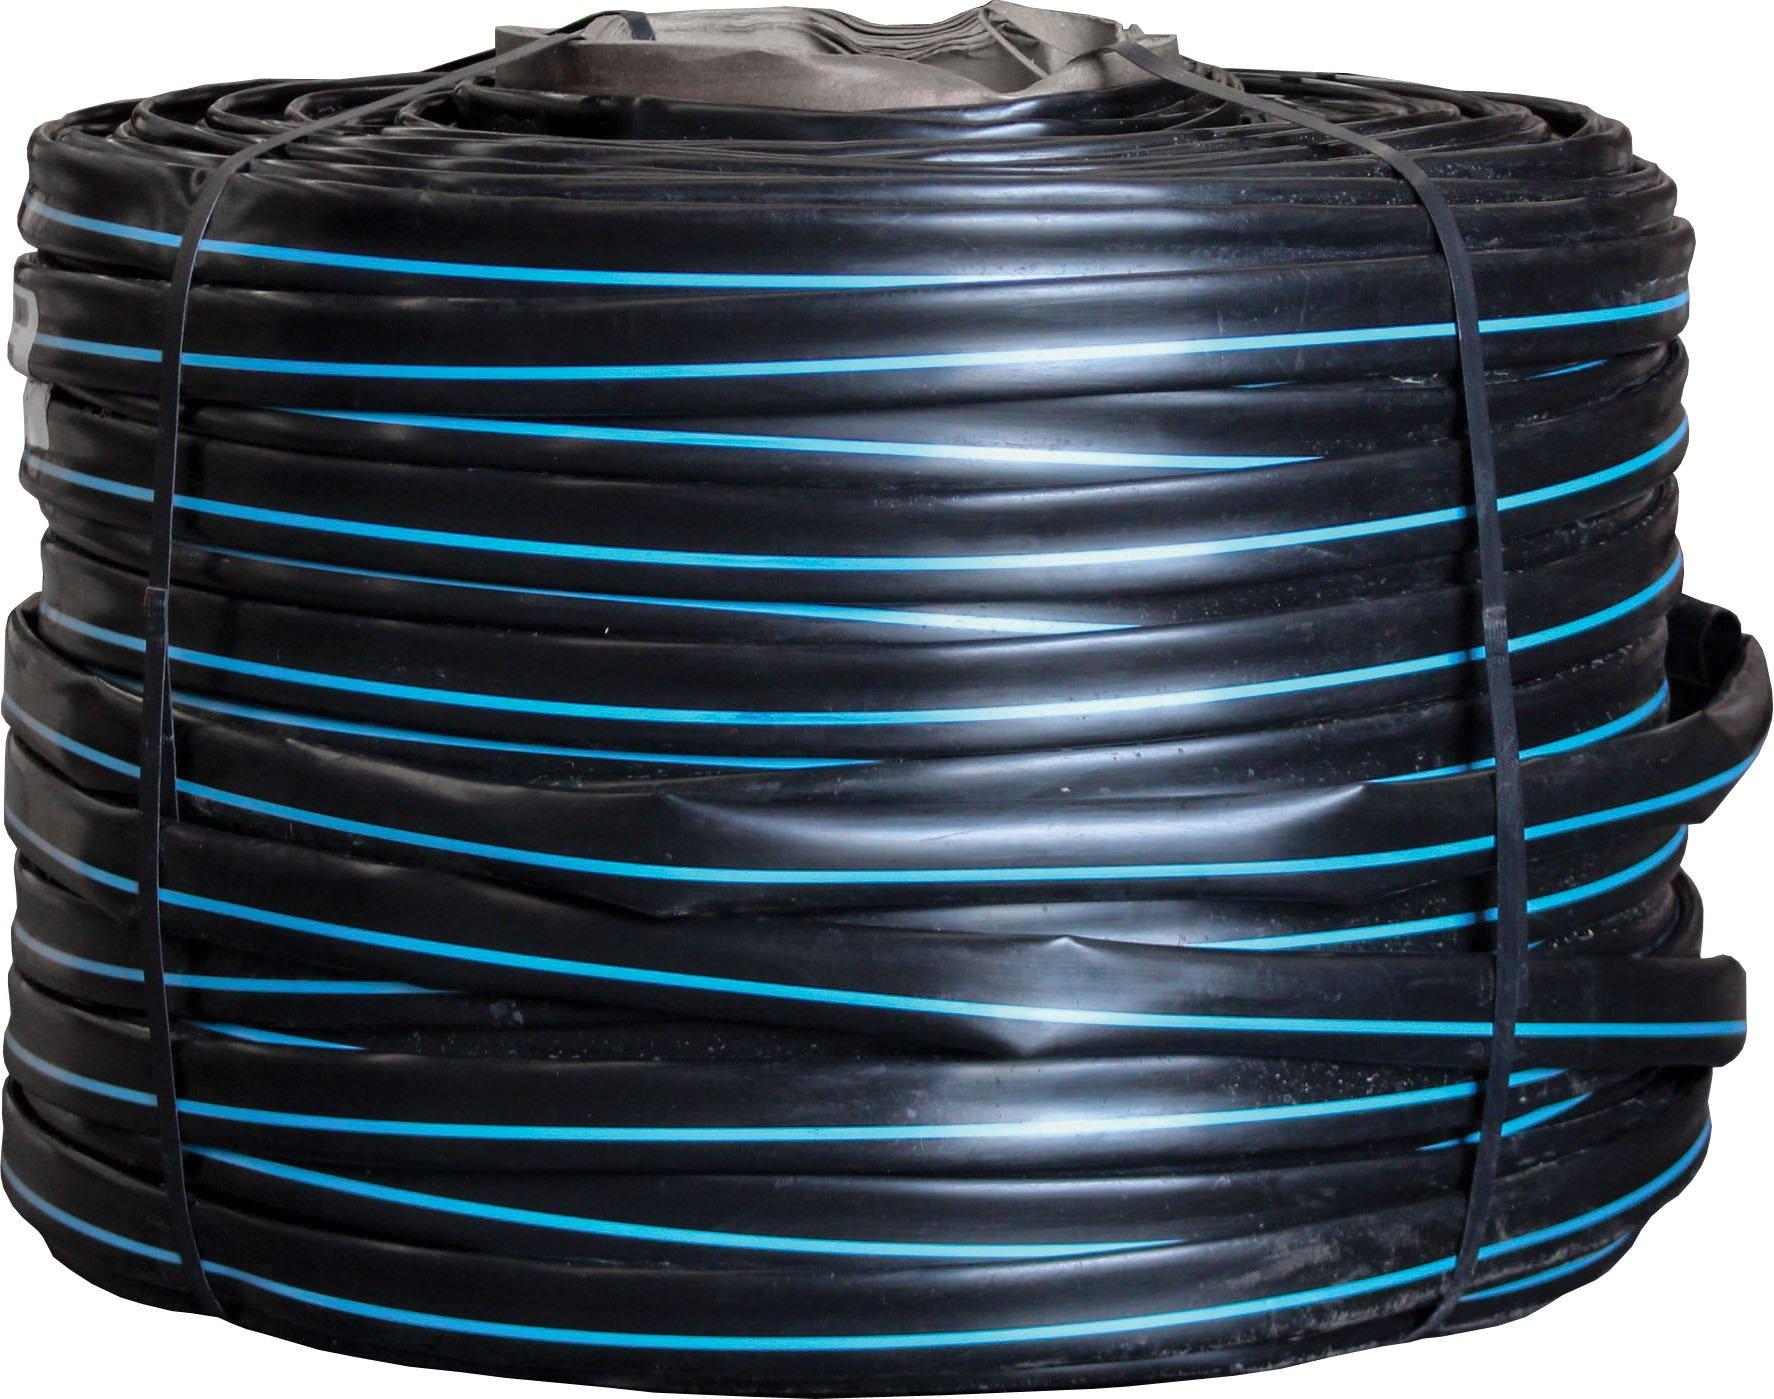 Toro 2'', 450', 21 psi, Blue Stripe Oval Hose - ELD5251-045, Plastic